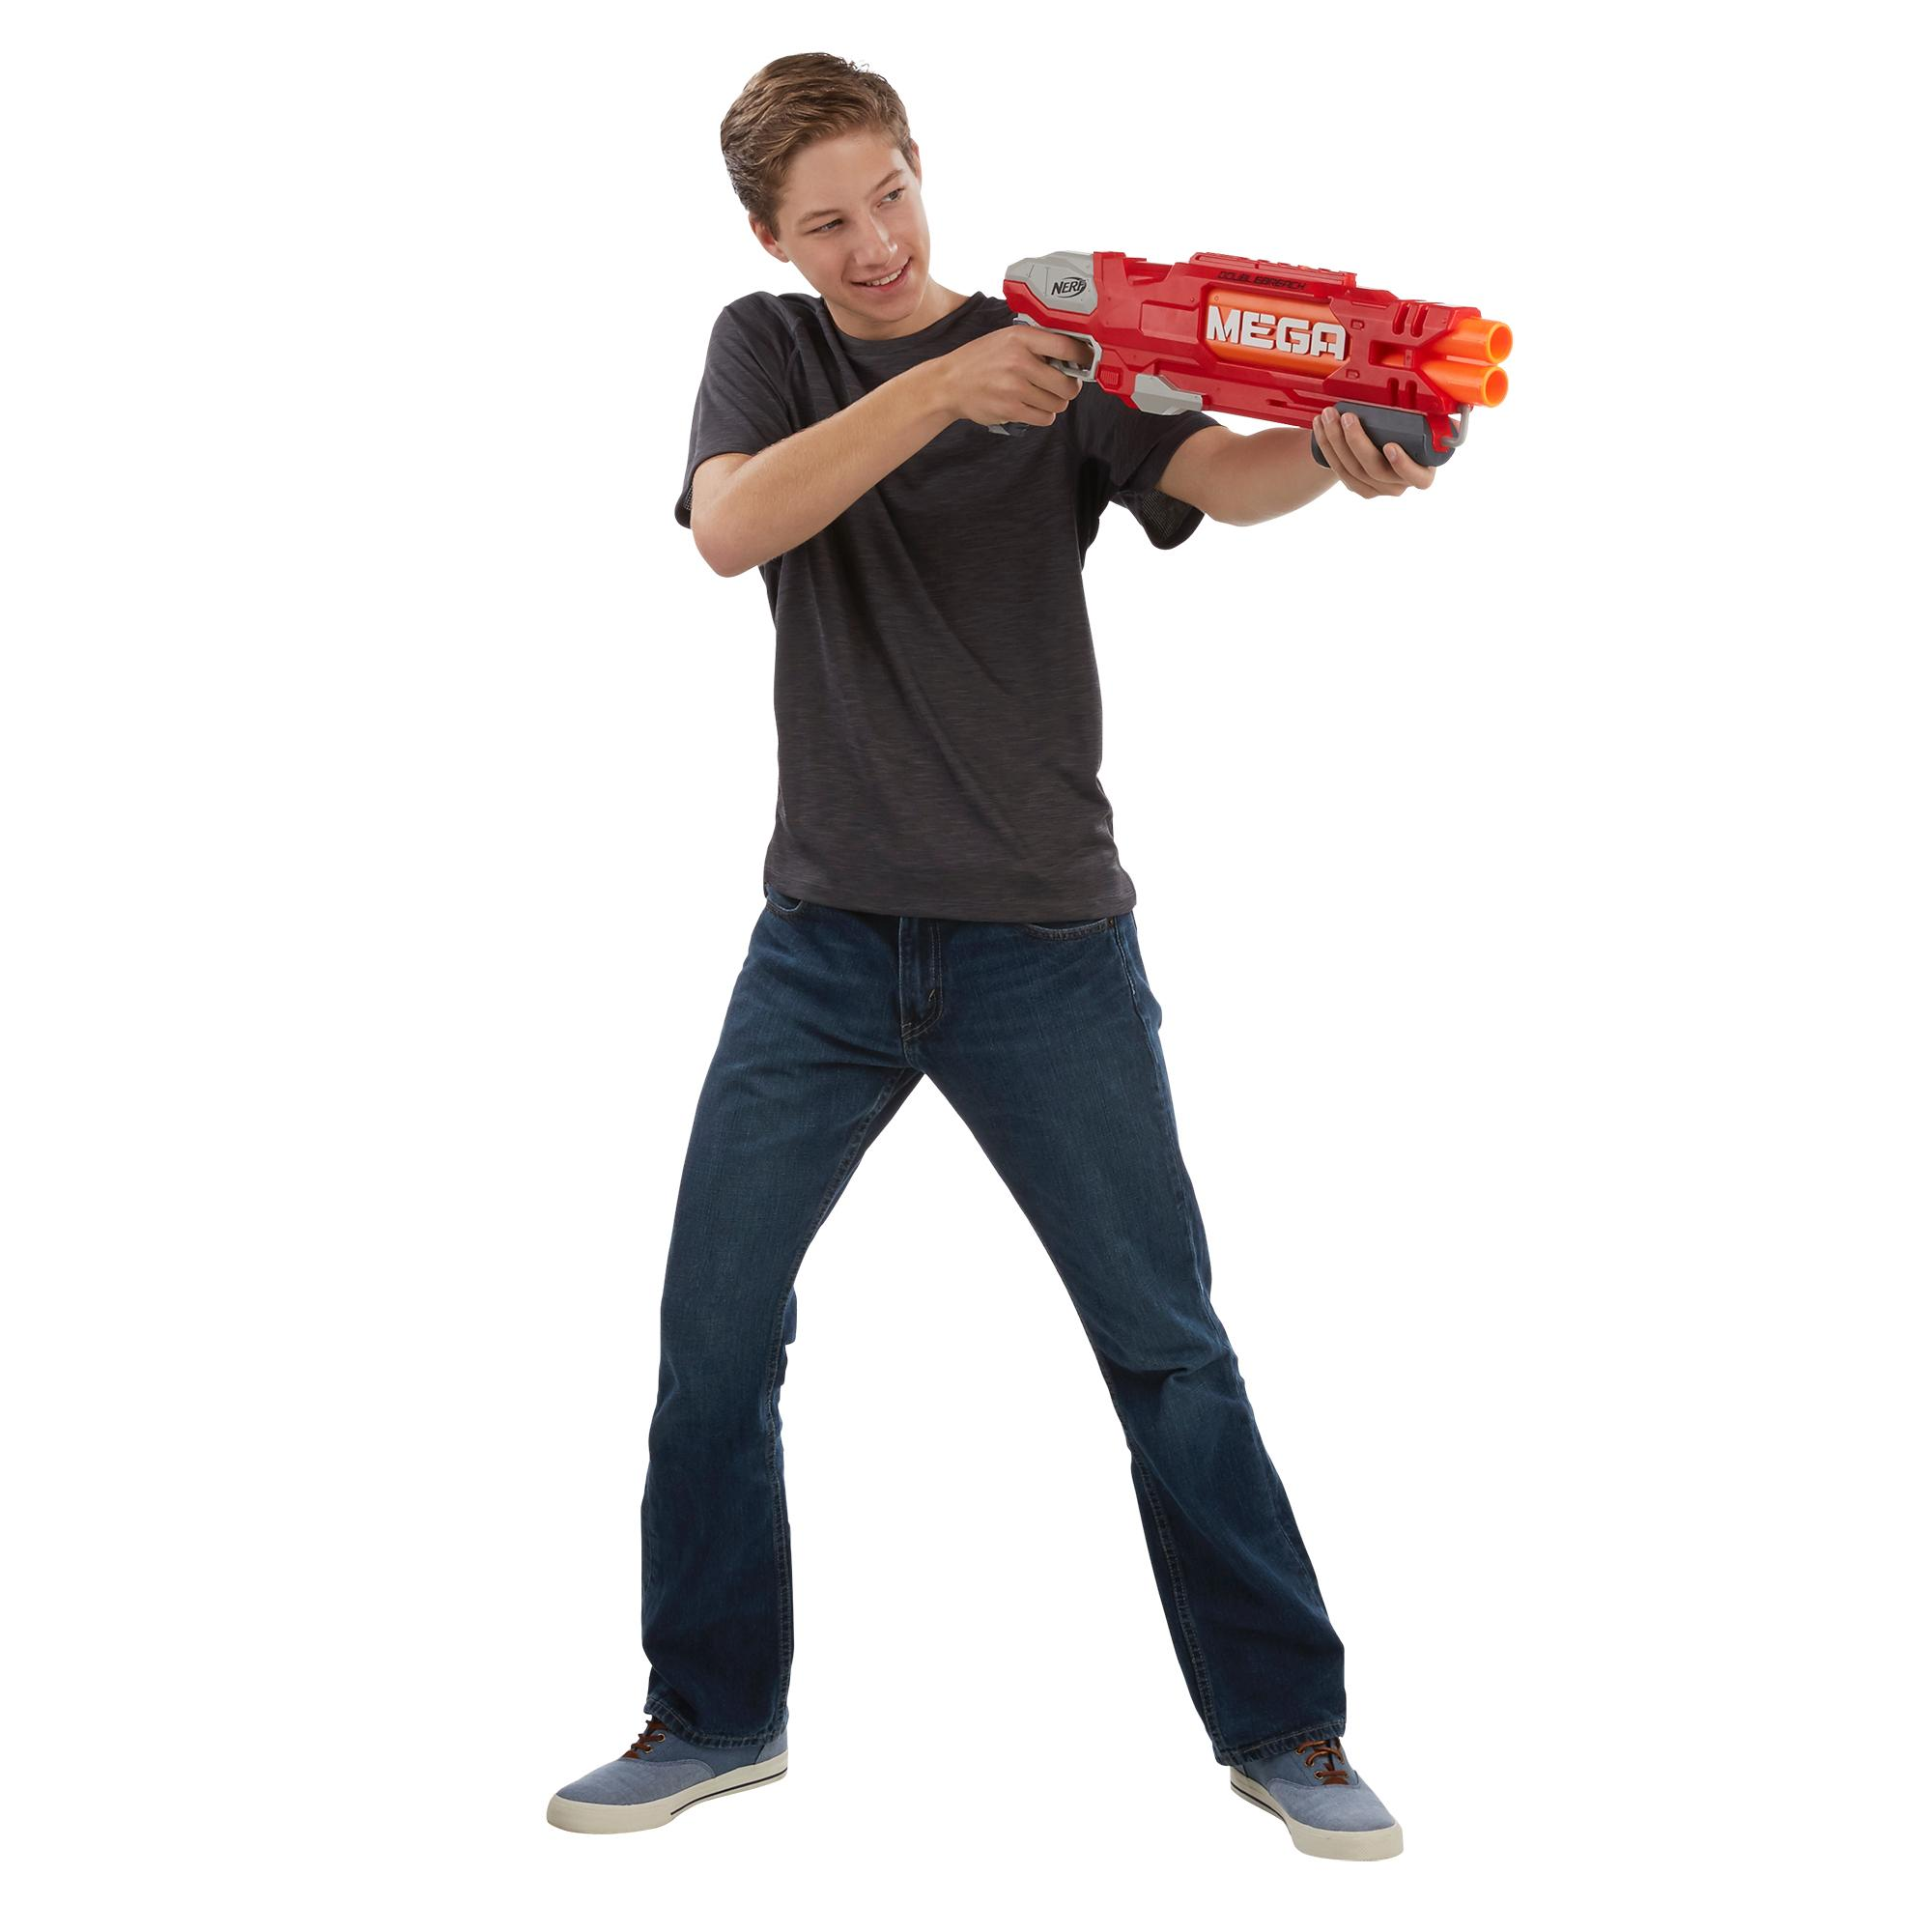 Lança Dardos Nerf Mega Doublebreach